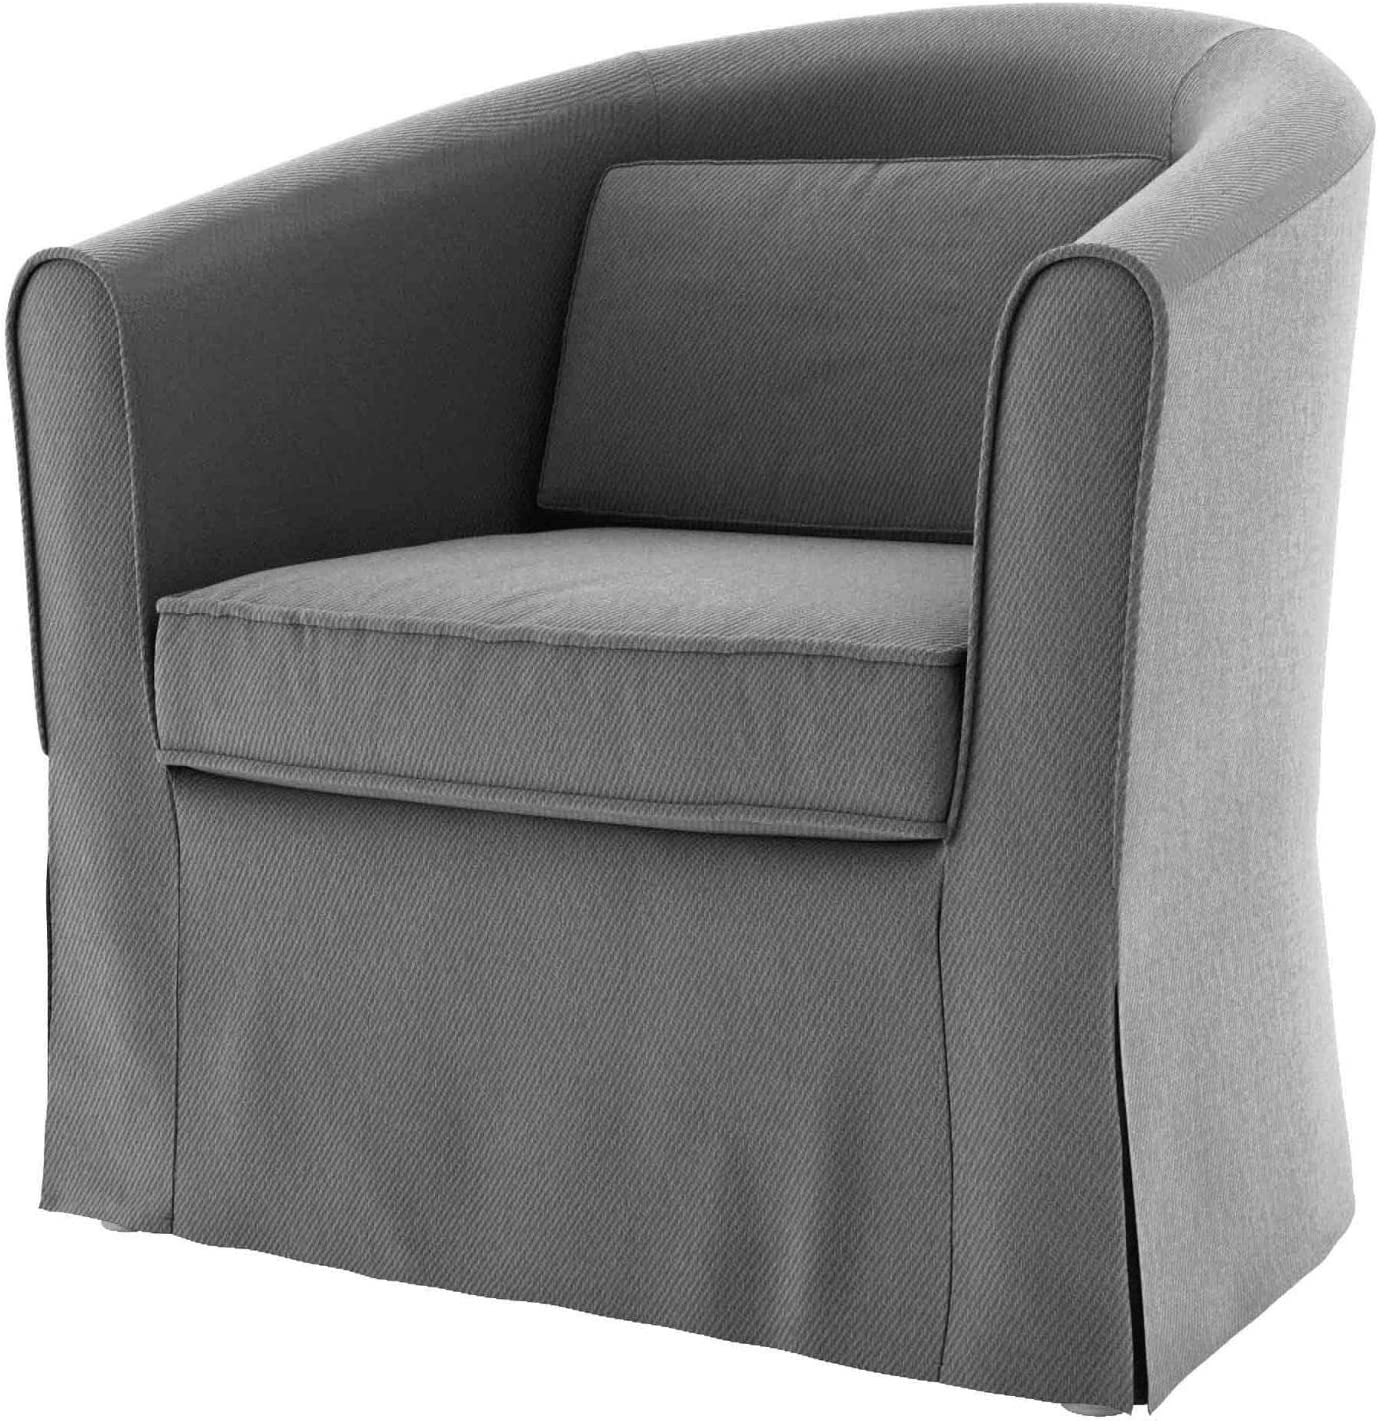 TLY Housse de Fauteuil en Coton Tullsta pour Chaise IKEA Tullsta